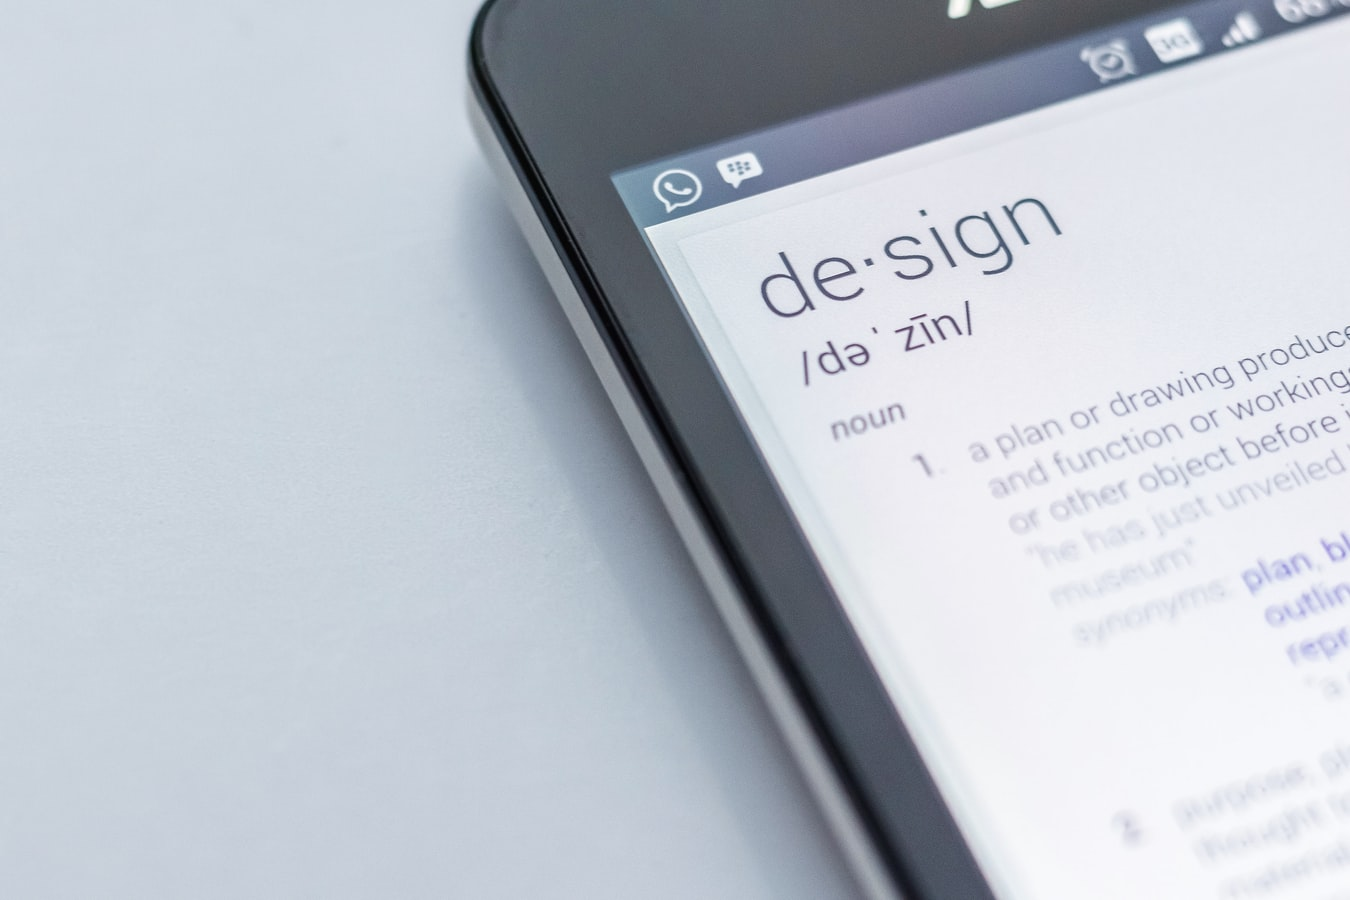 design_sites_web_internet_webmaster_chloe_durand